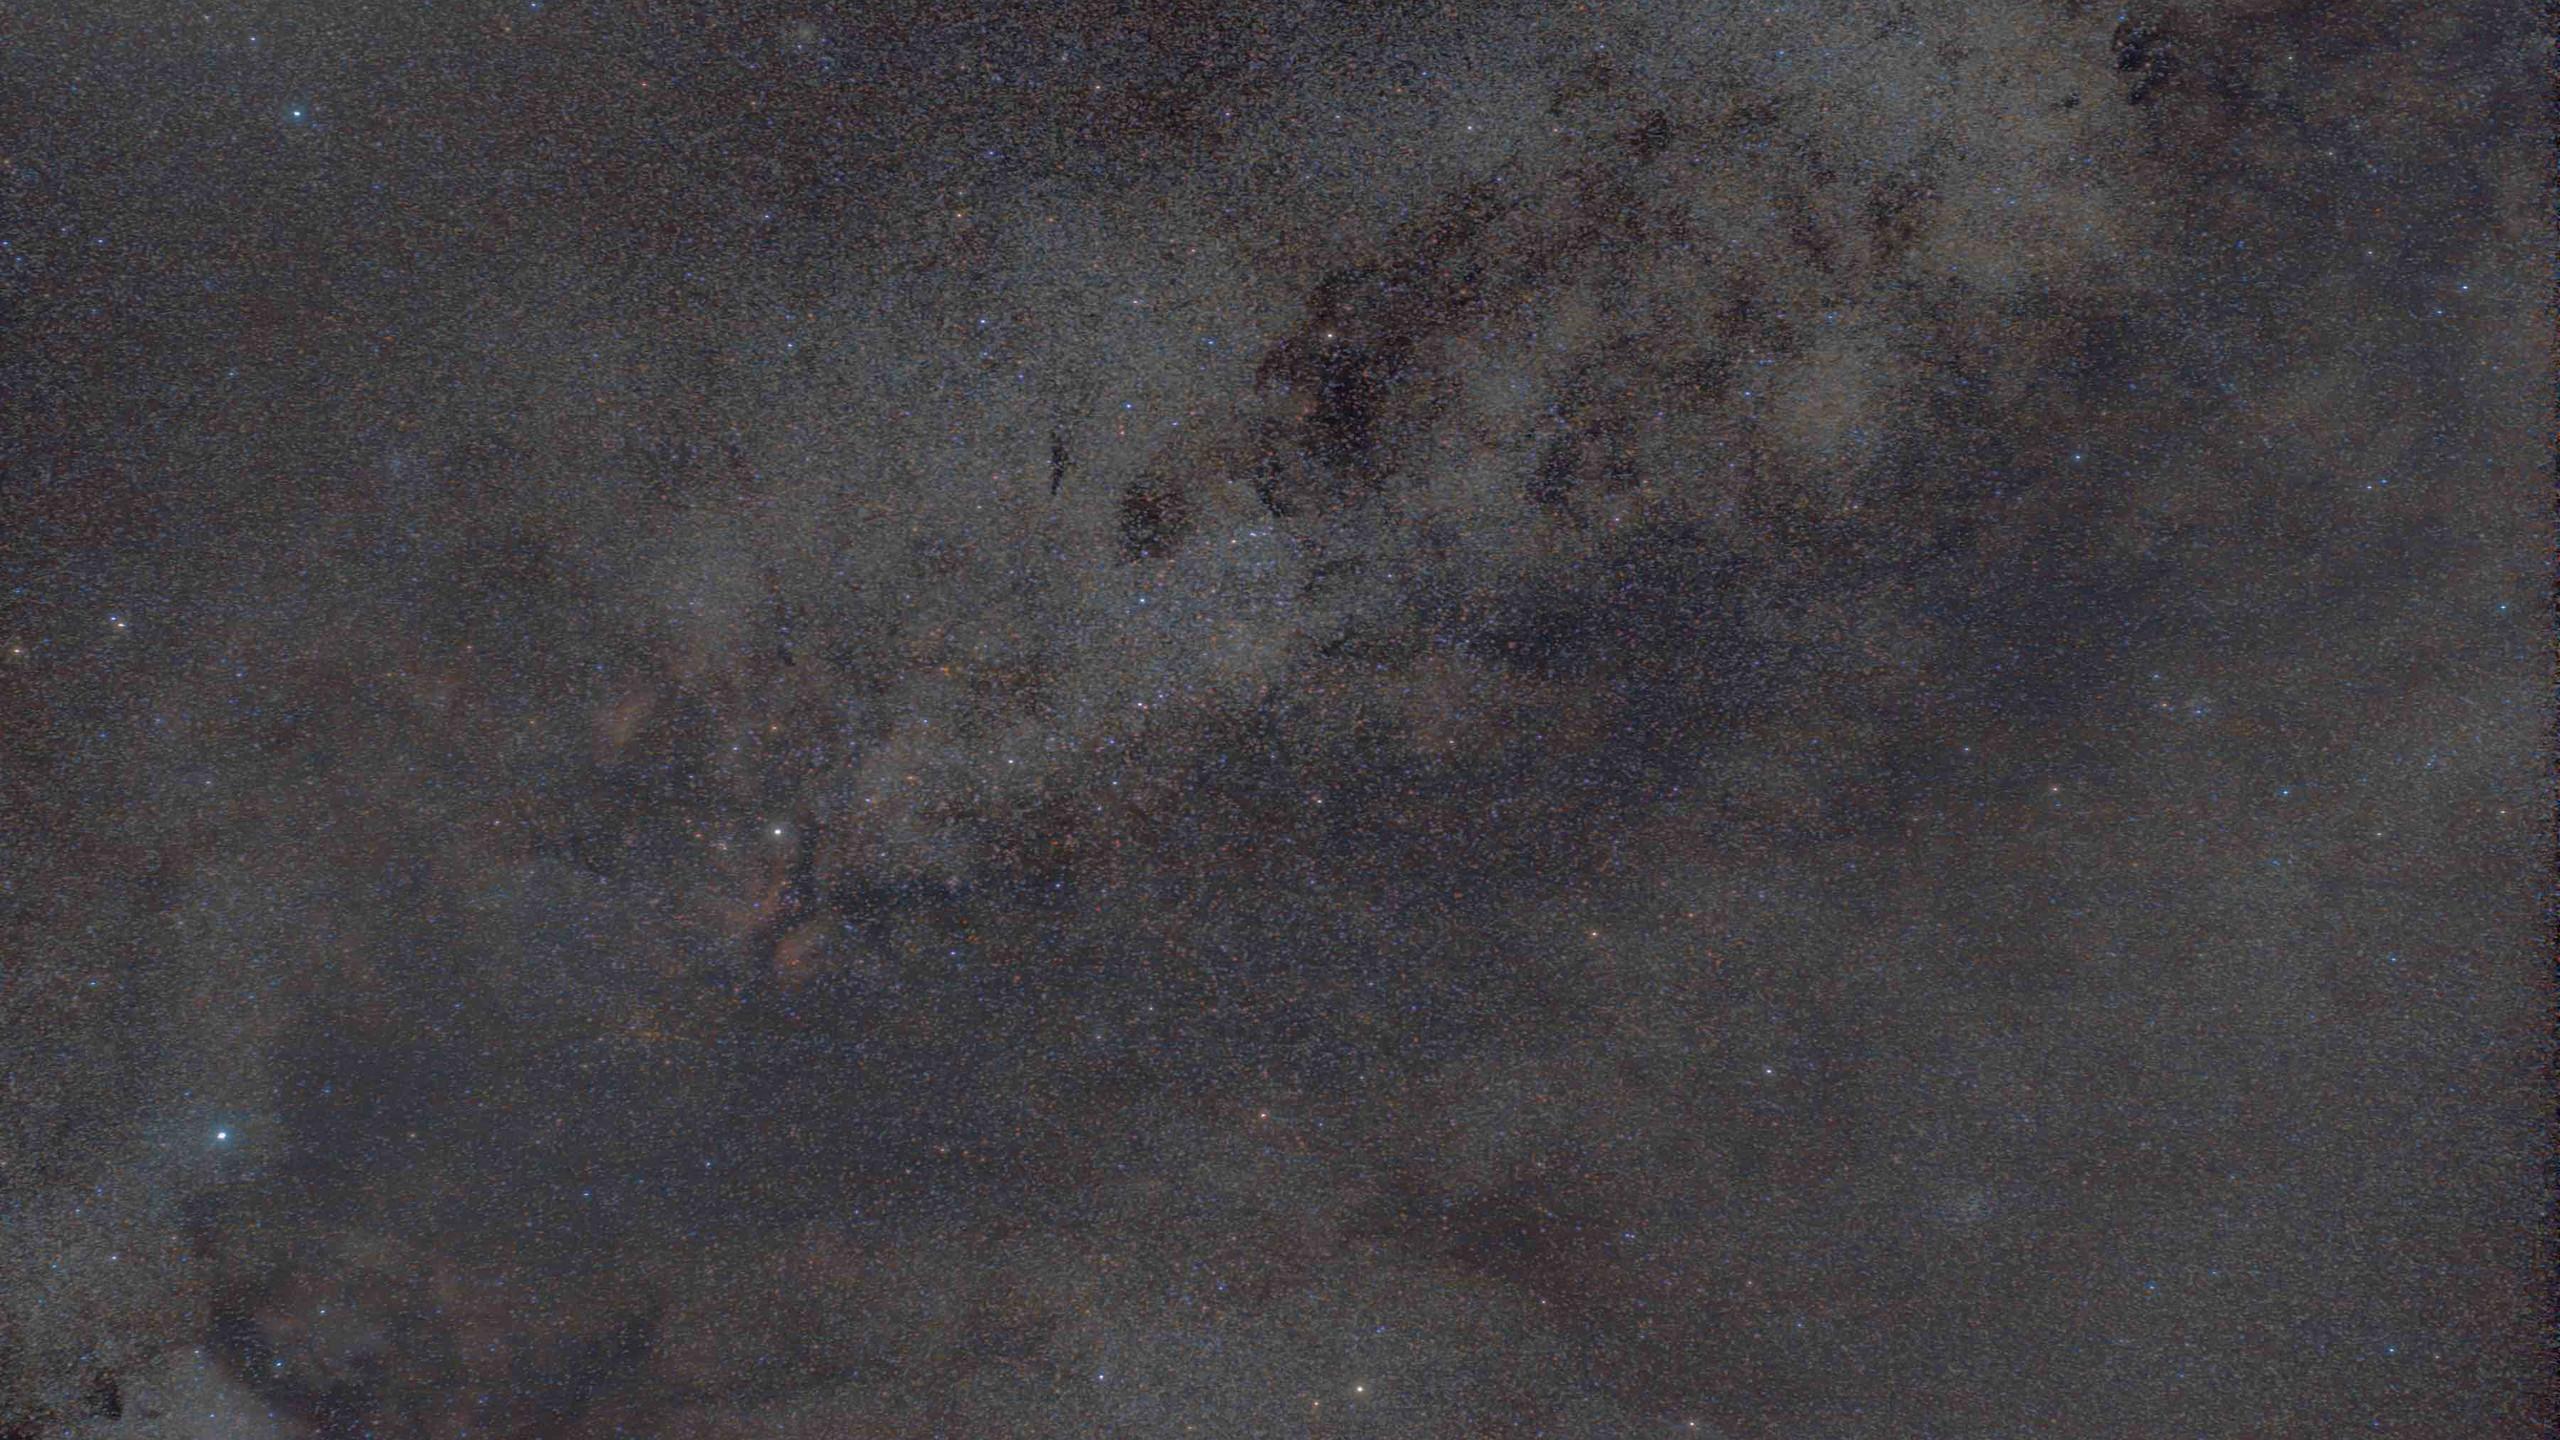 Cygnus widefield DSLR Astrophotography